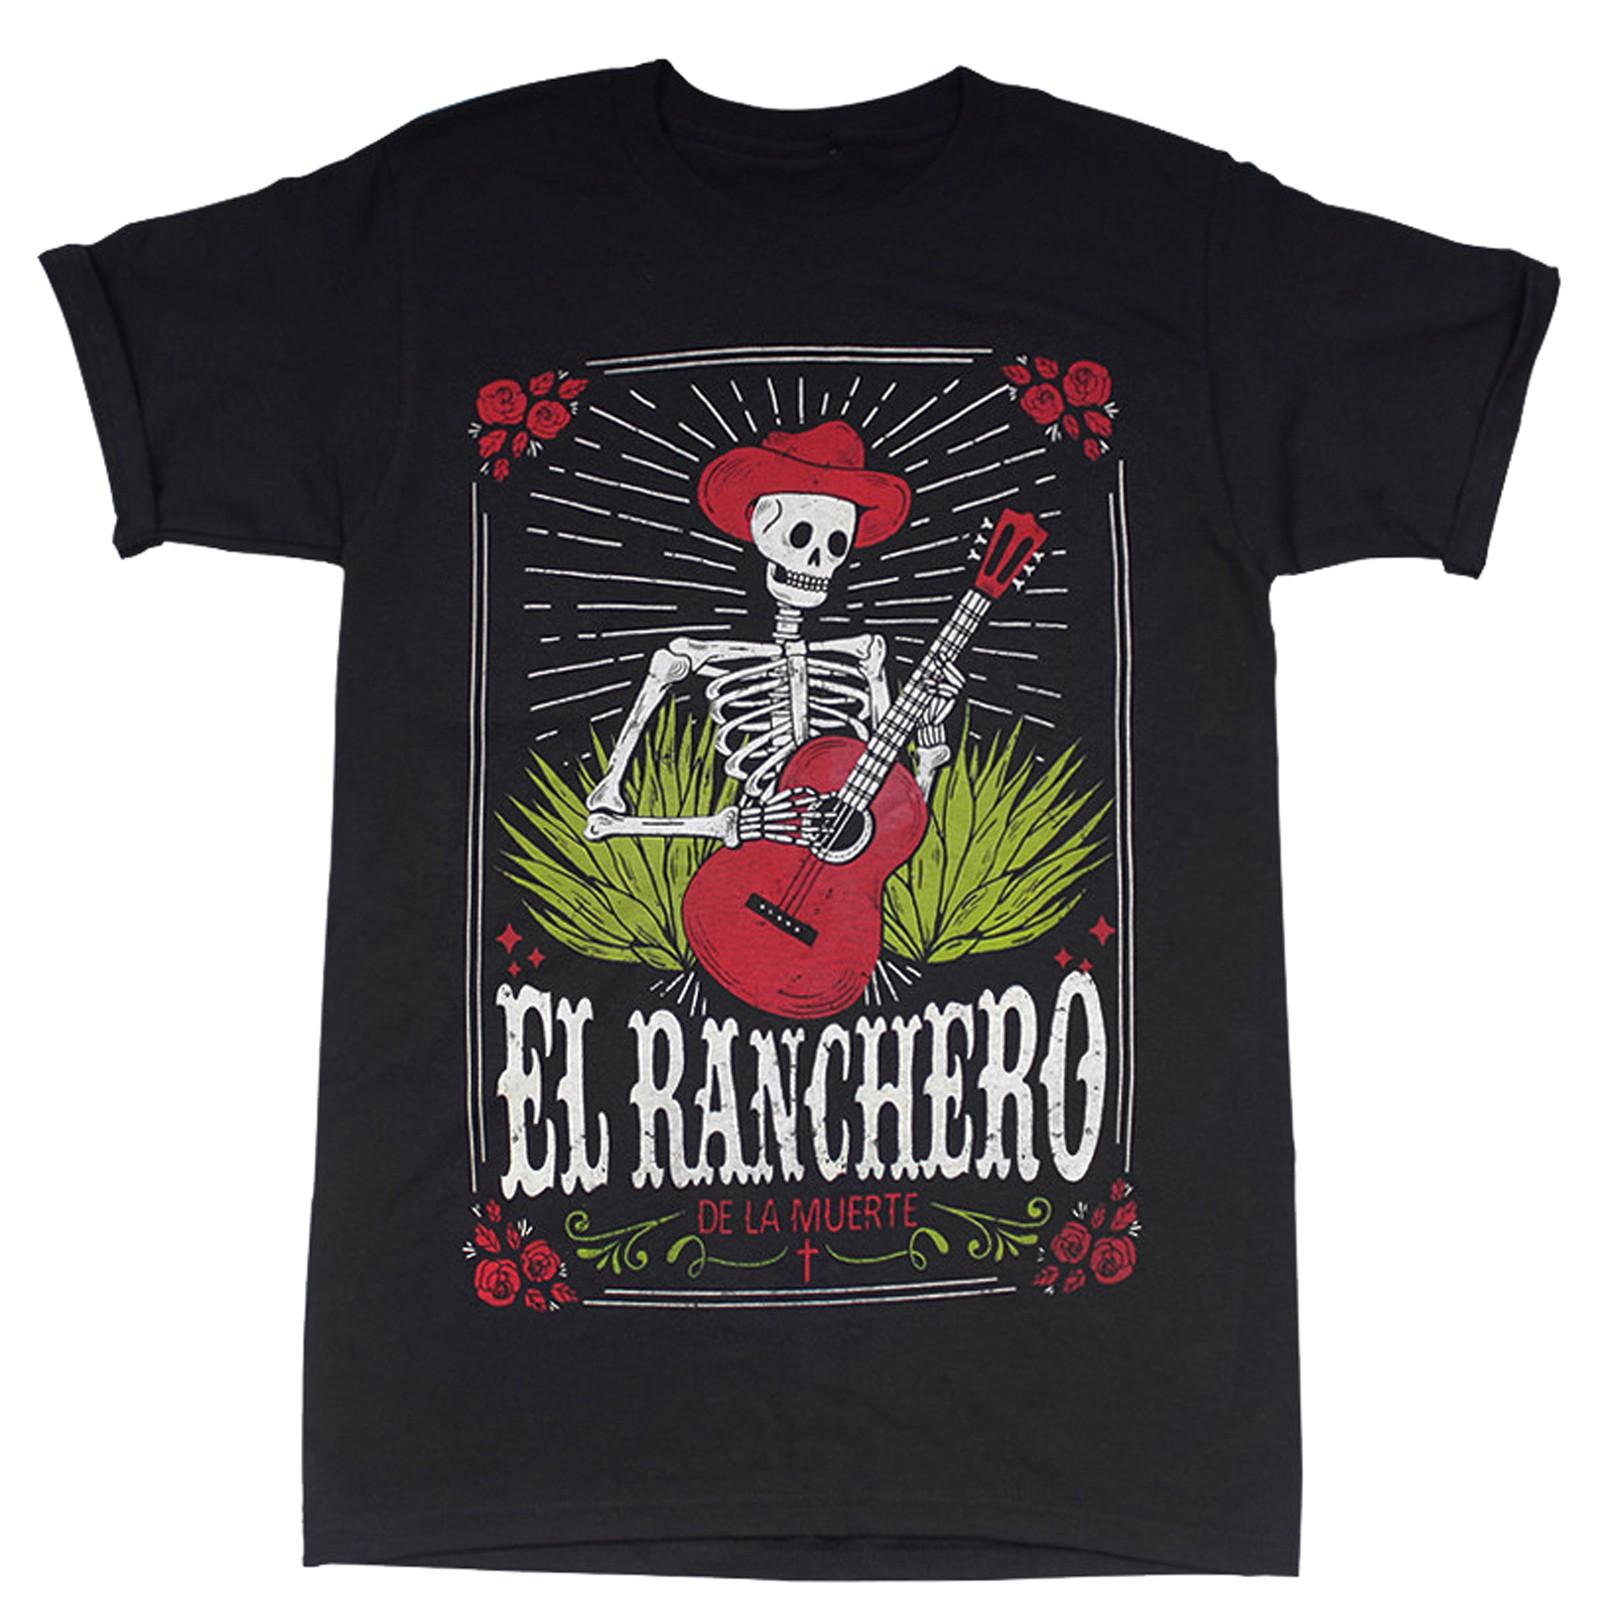 La Marca Del Diablo - Ranchero de la Muerte T-Shirt